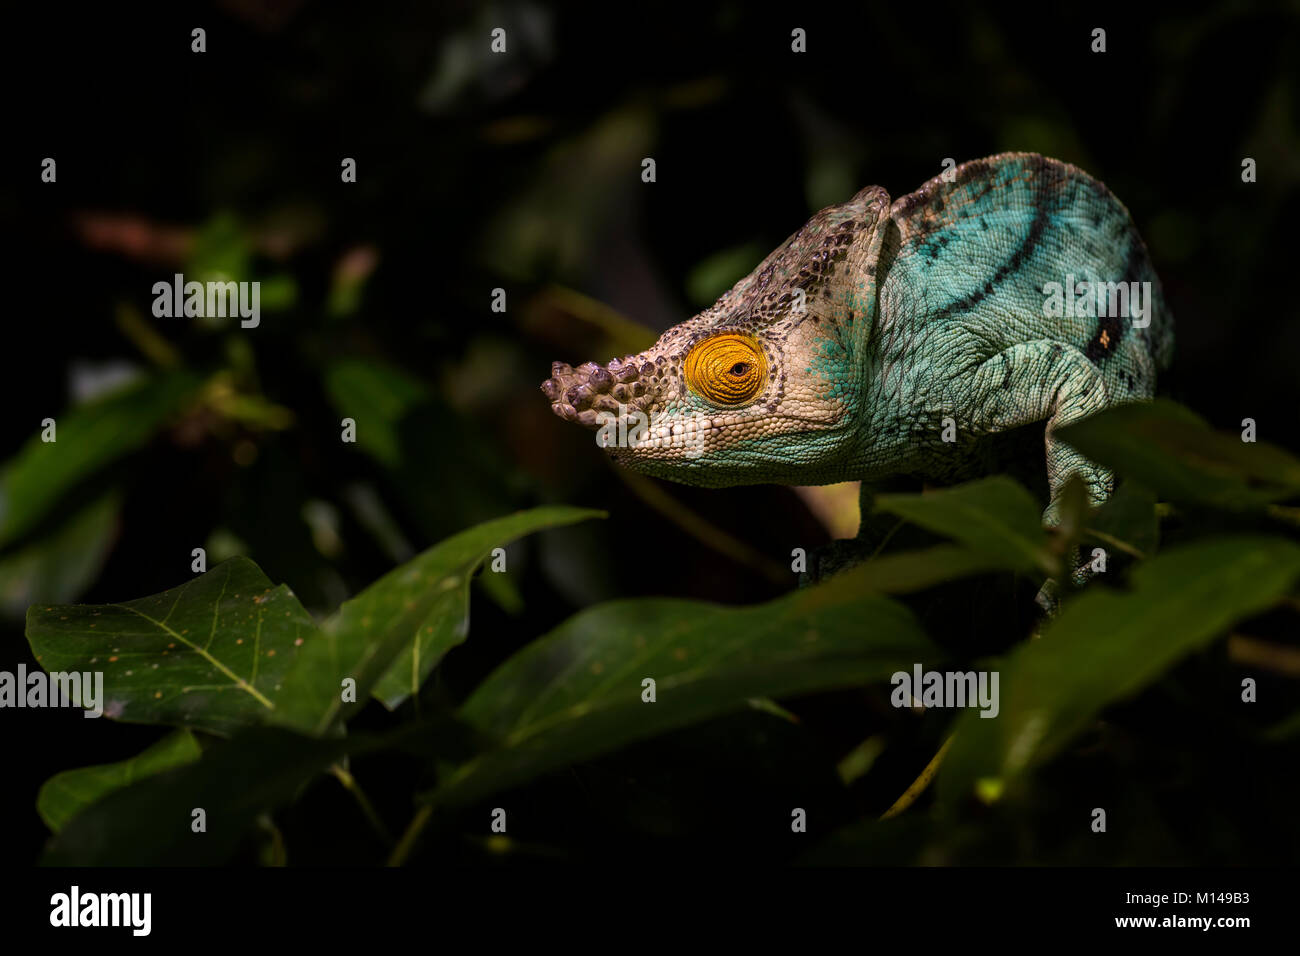 Parson's Chameleon - Calumma parsonii, rain forest Madagascar east coast. Colourful endemic lizard. - Stock Image